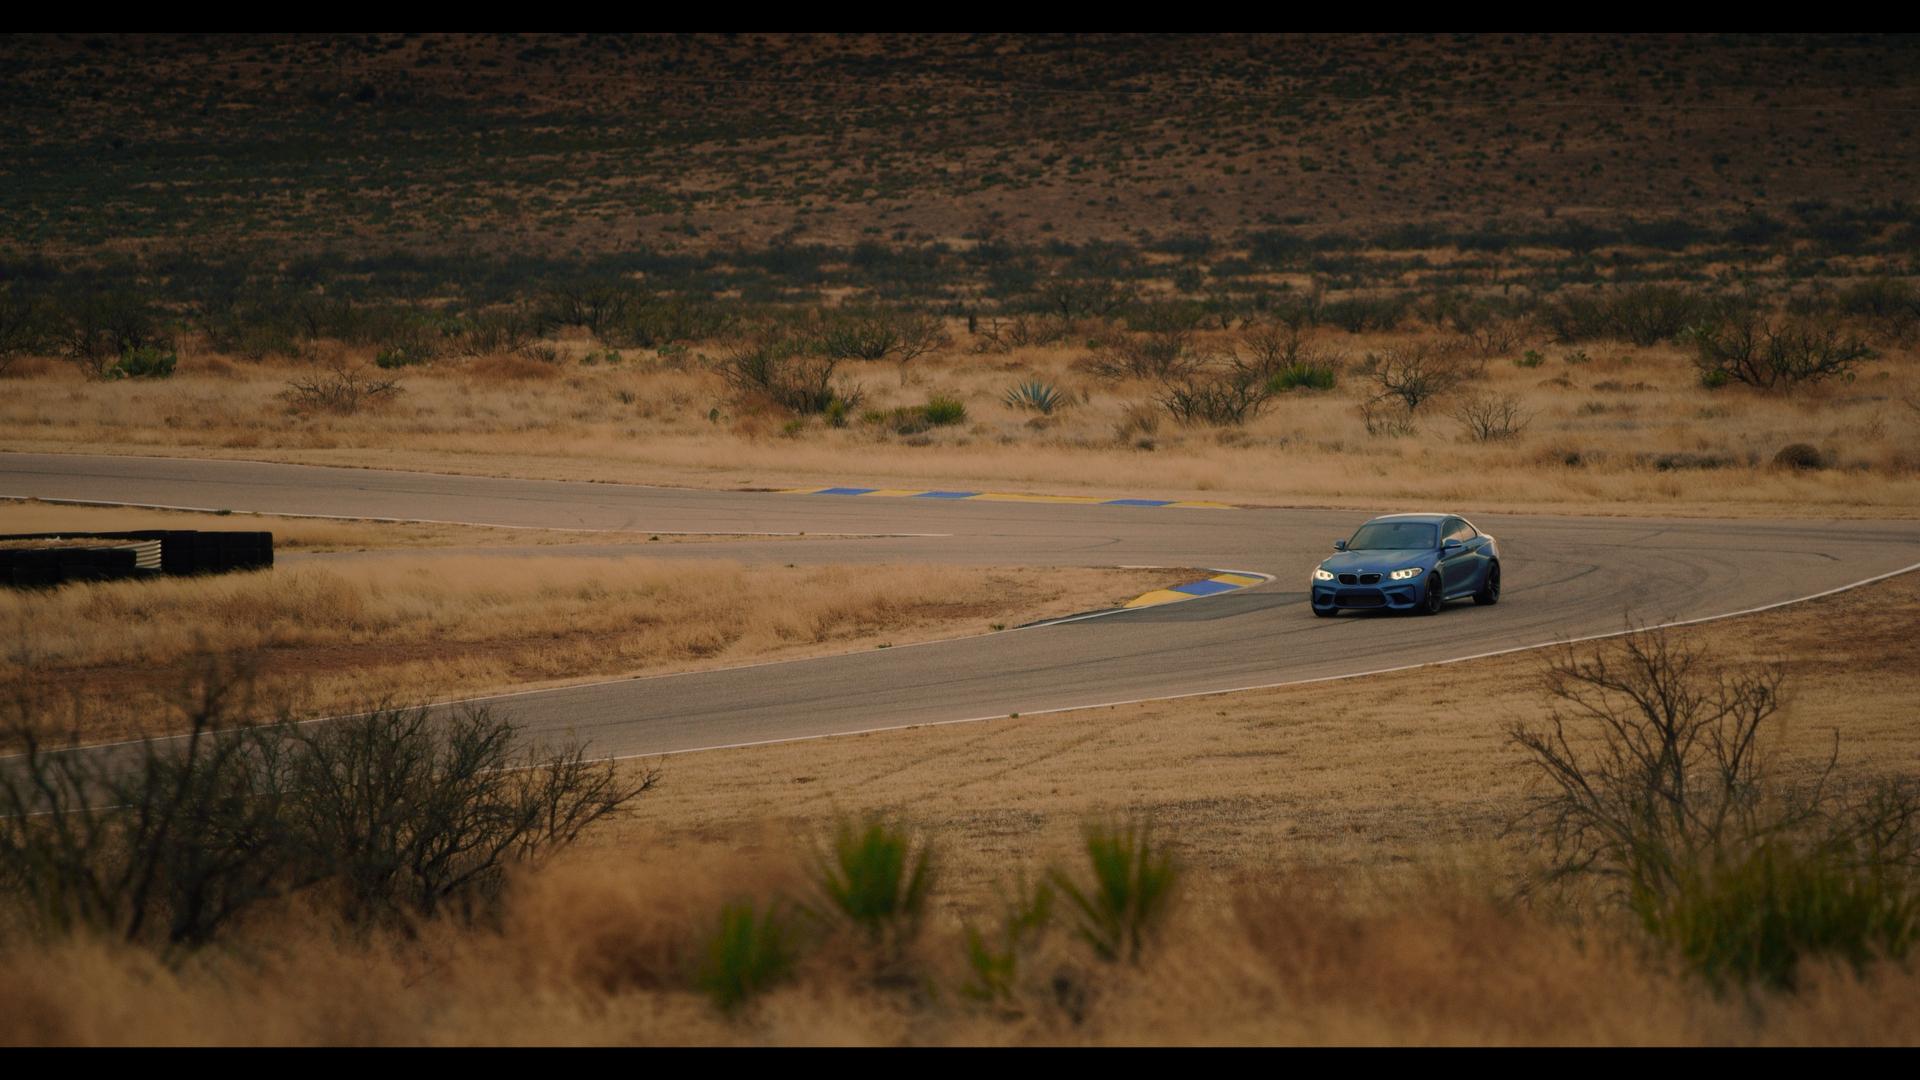 BMW_1.5.1.jpg